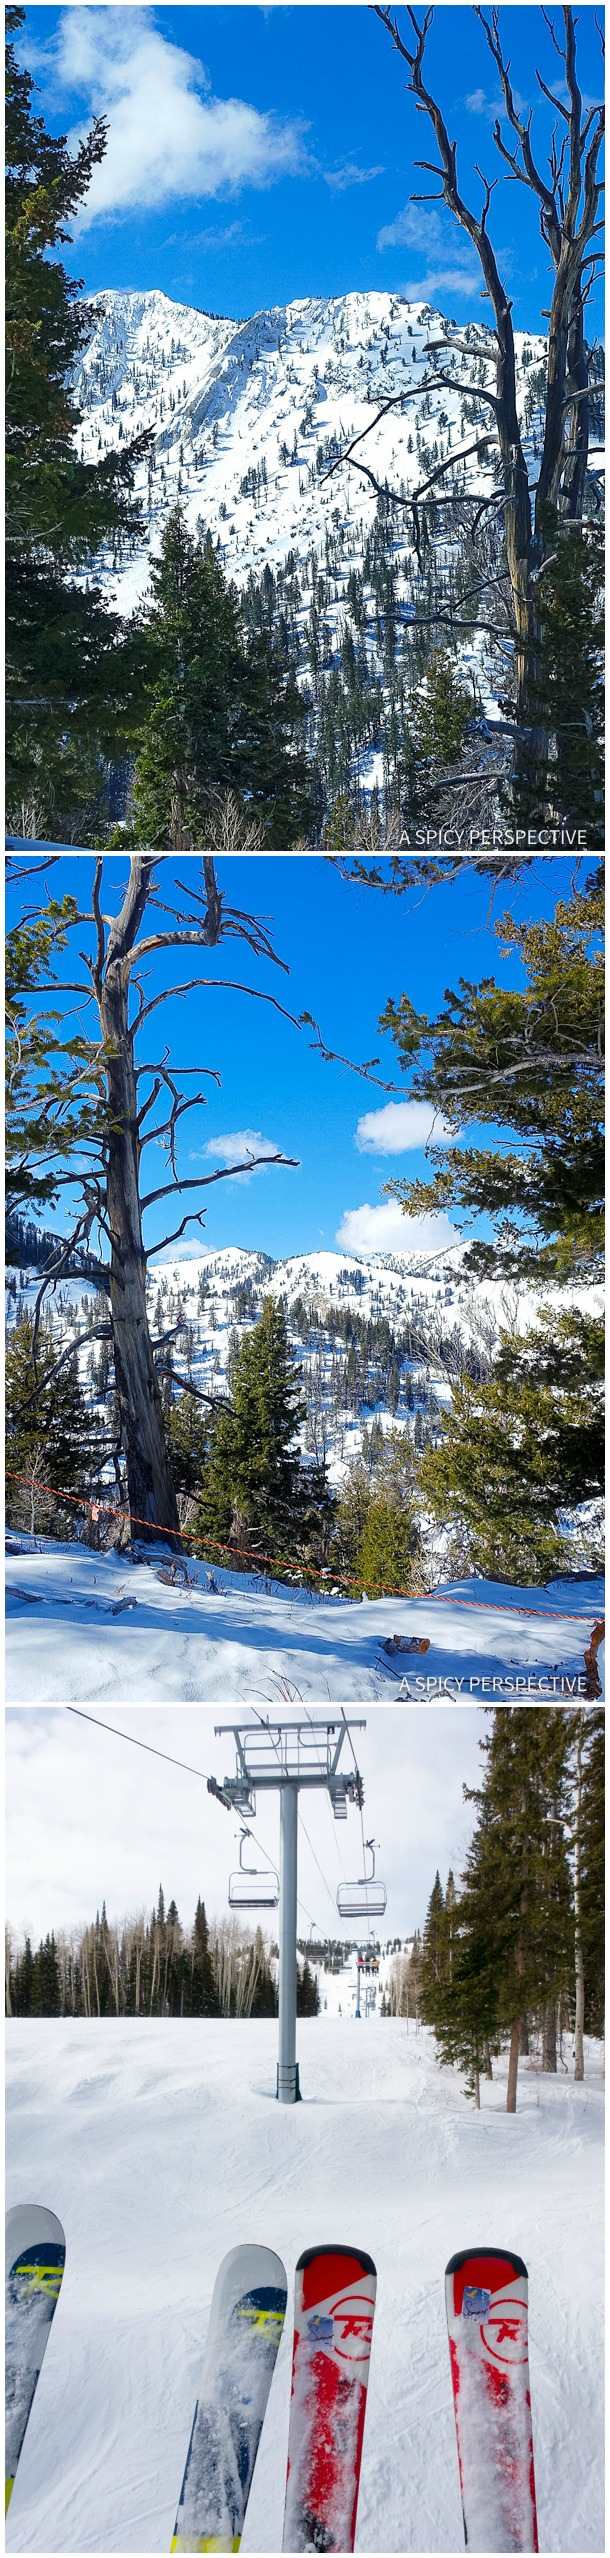 Why You Should Ski Solitude Mountain Resort